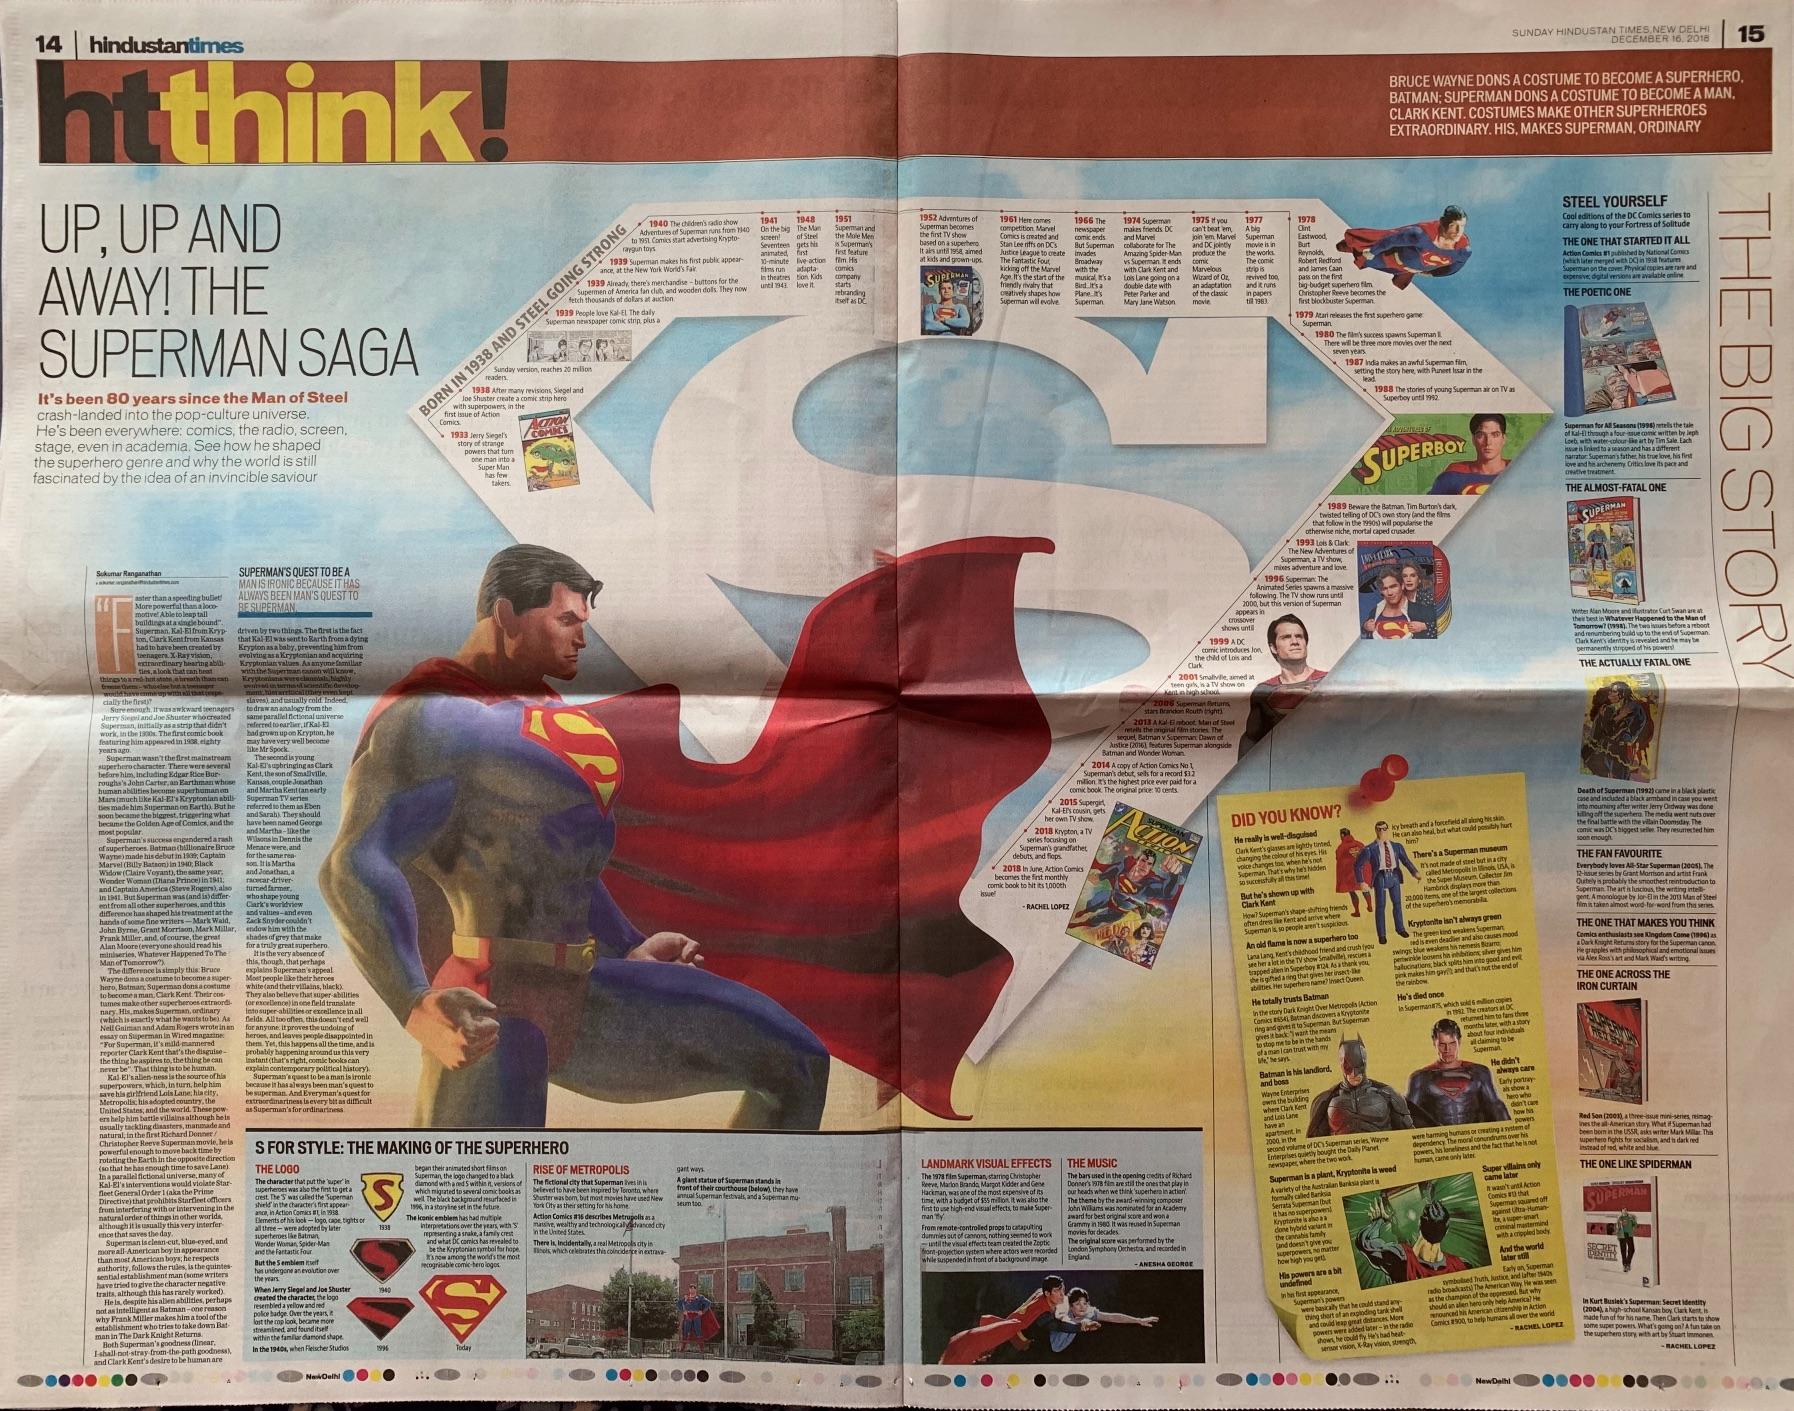 The Hindustan Times